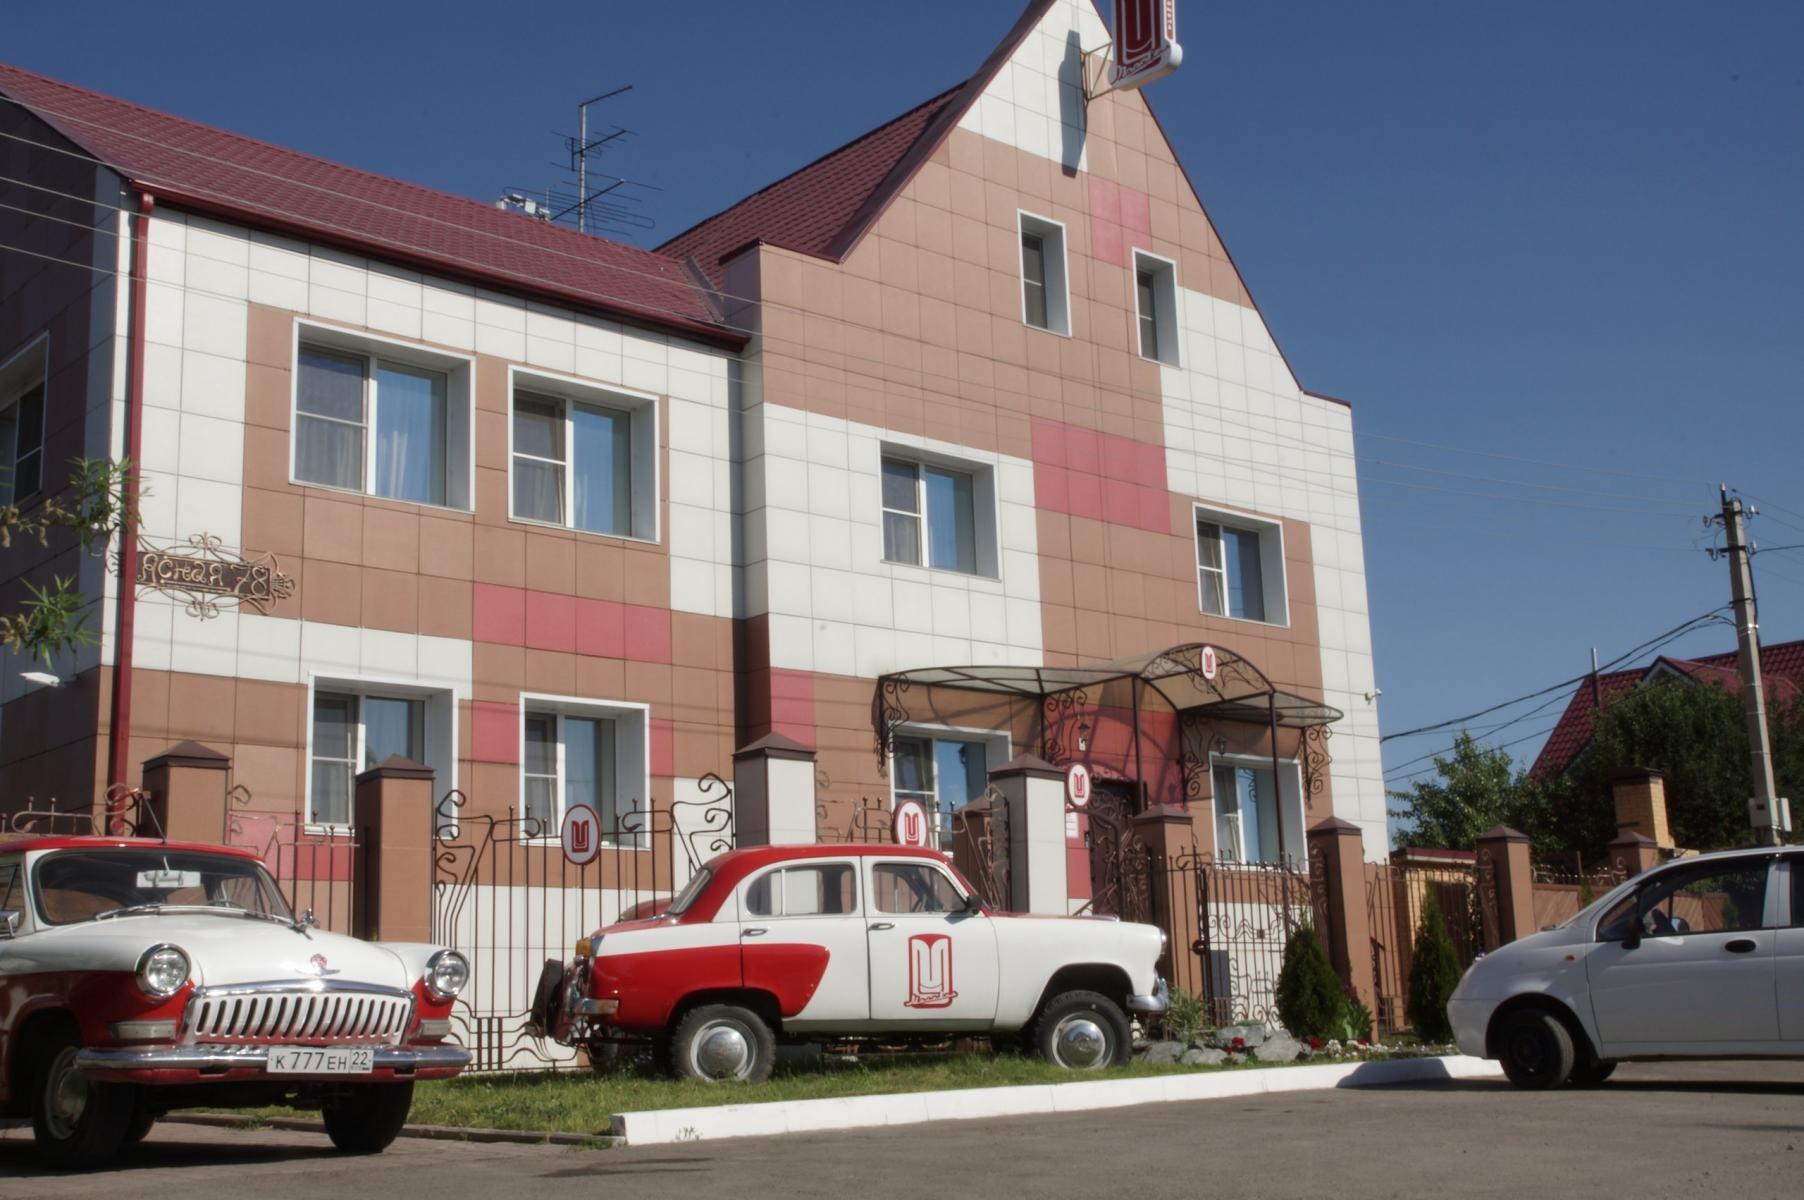 Москвич, гостевой дом - №17